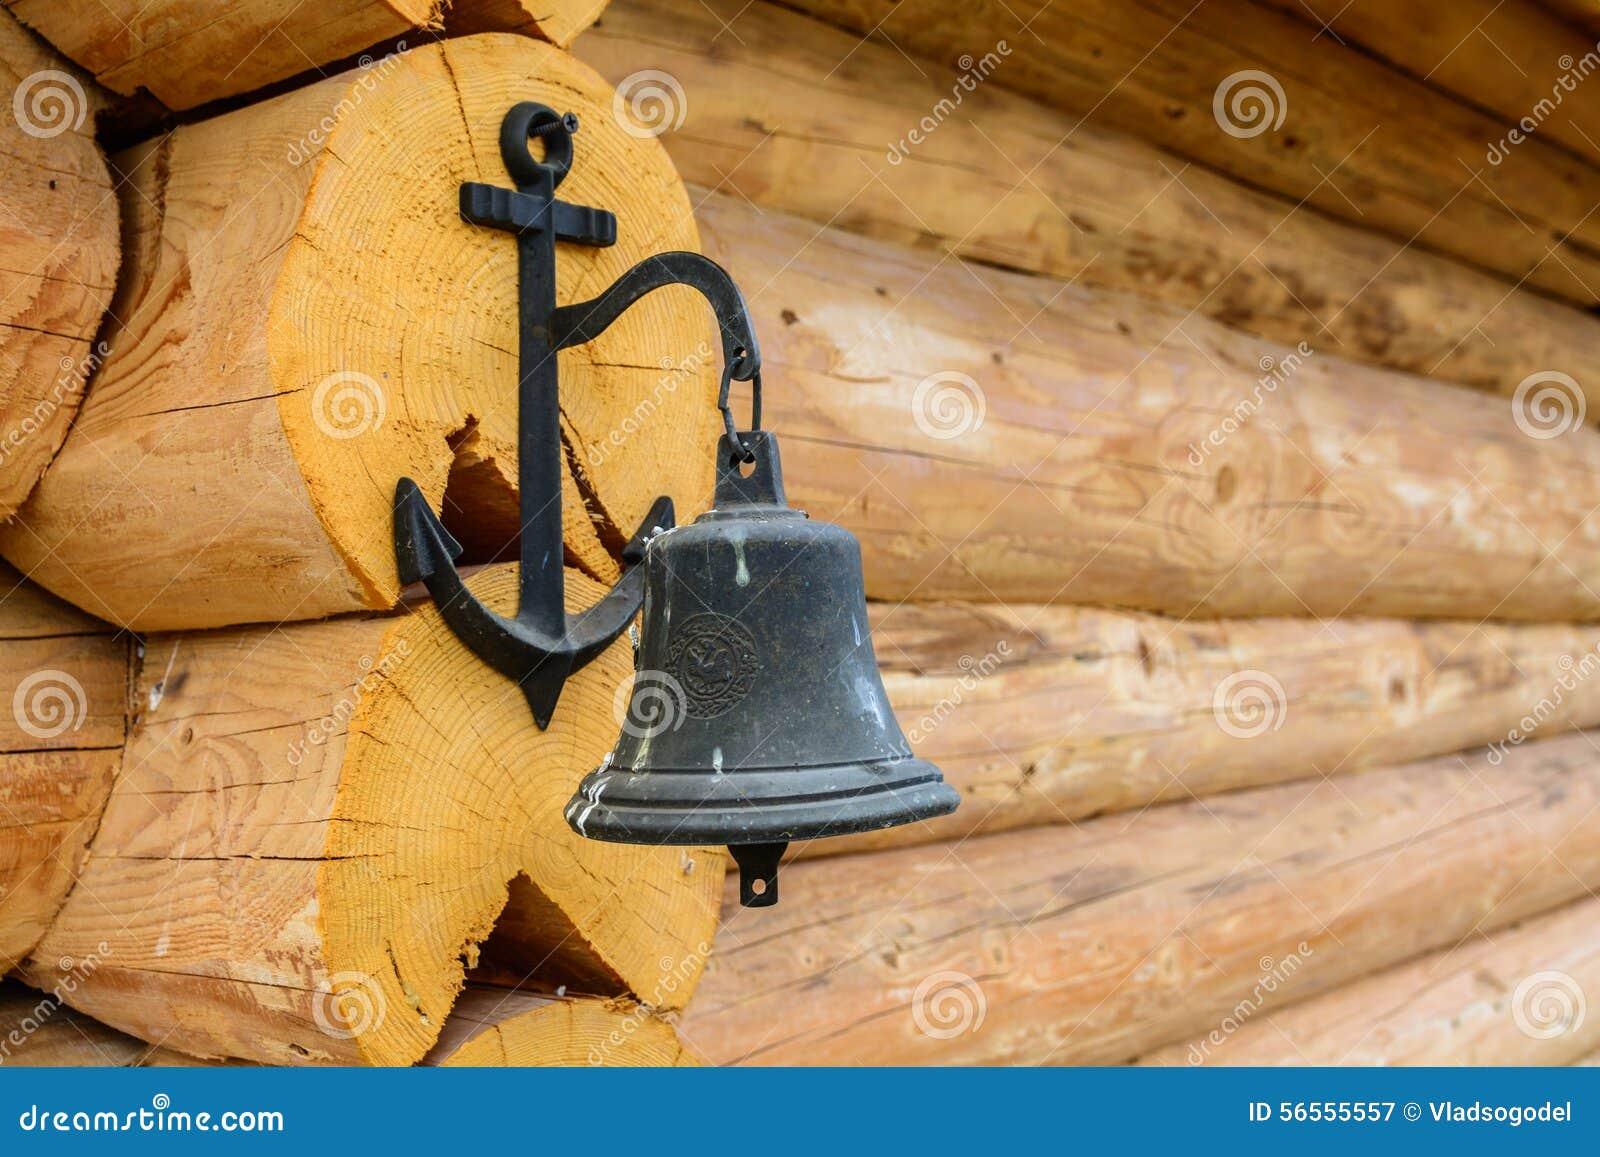 Download Ένωση κουδουνιών σιδήρου στον ξύλινο τοίχο εξοχικών σπιτιών Στοκ Εικόνα - εικόνα από ατρόπων, grunge: 56555557